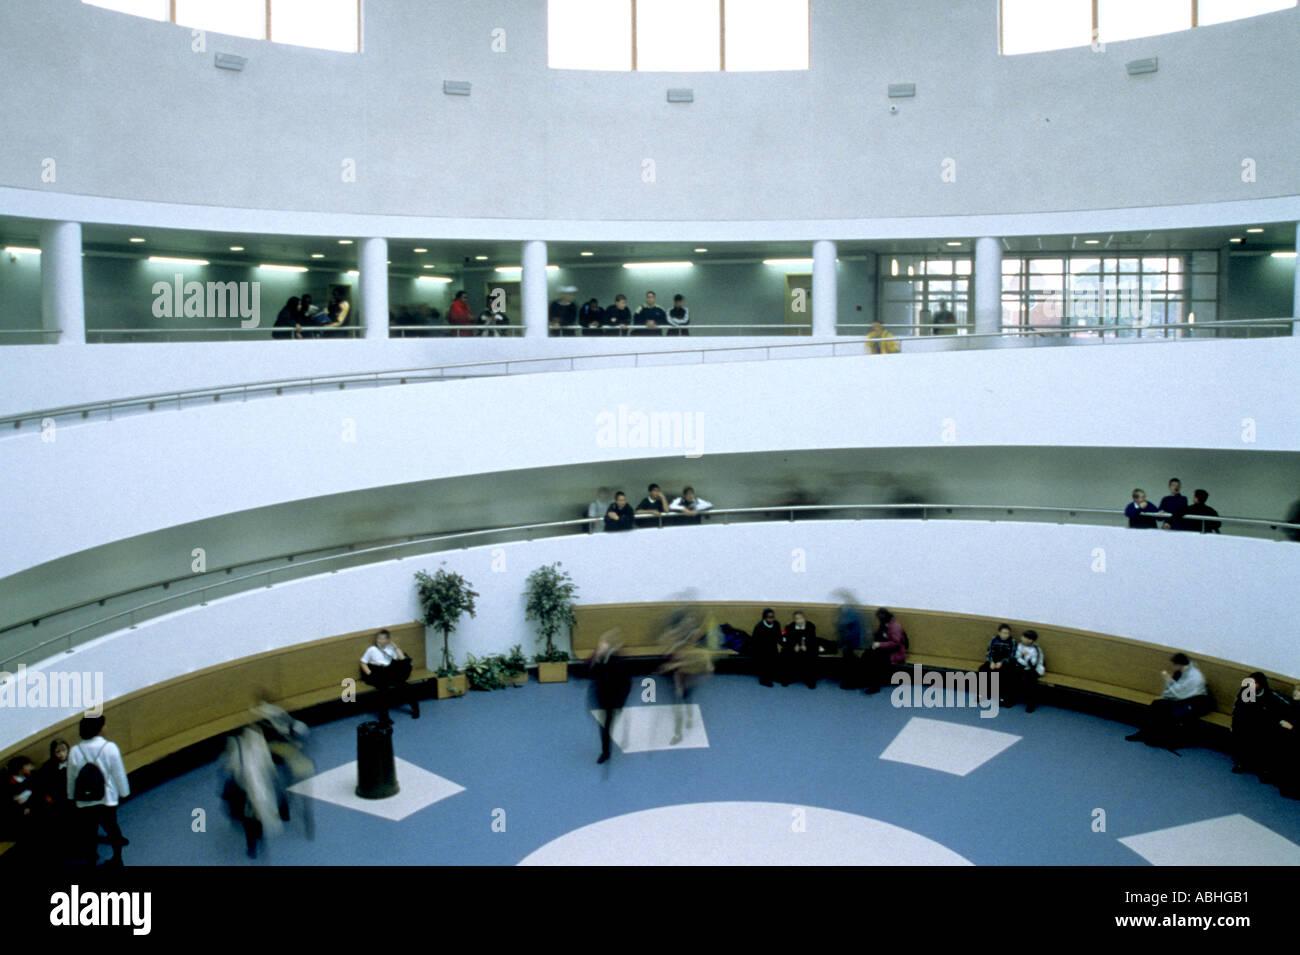 Royal Docks School Stratford London UK. The atrium of this community college taken October 1999 - Stock Image